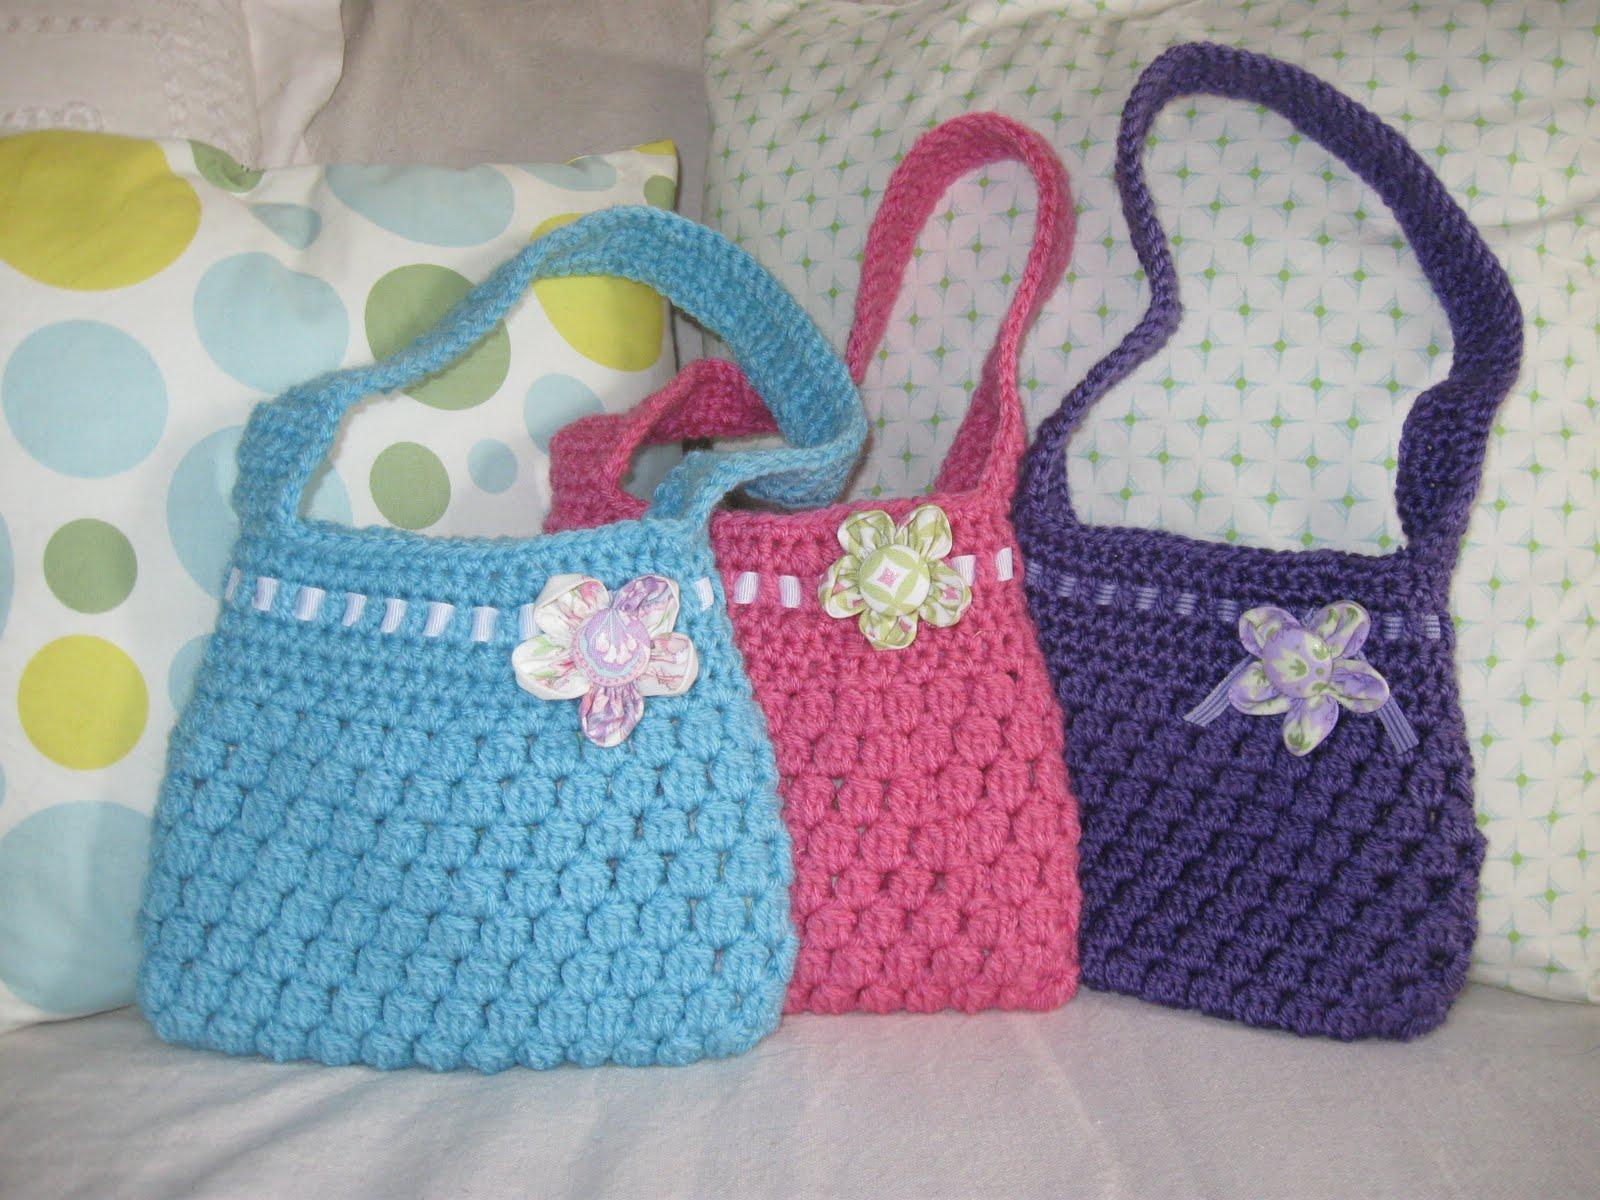 Pattern Pride Hello Speckless Crochet/Craft/Home